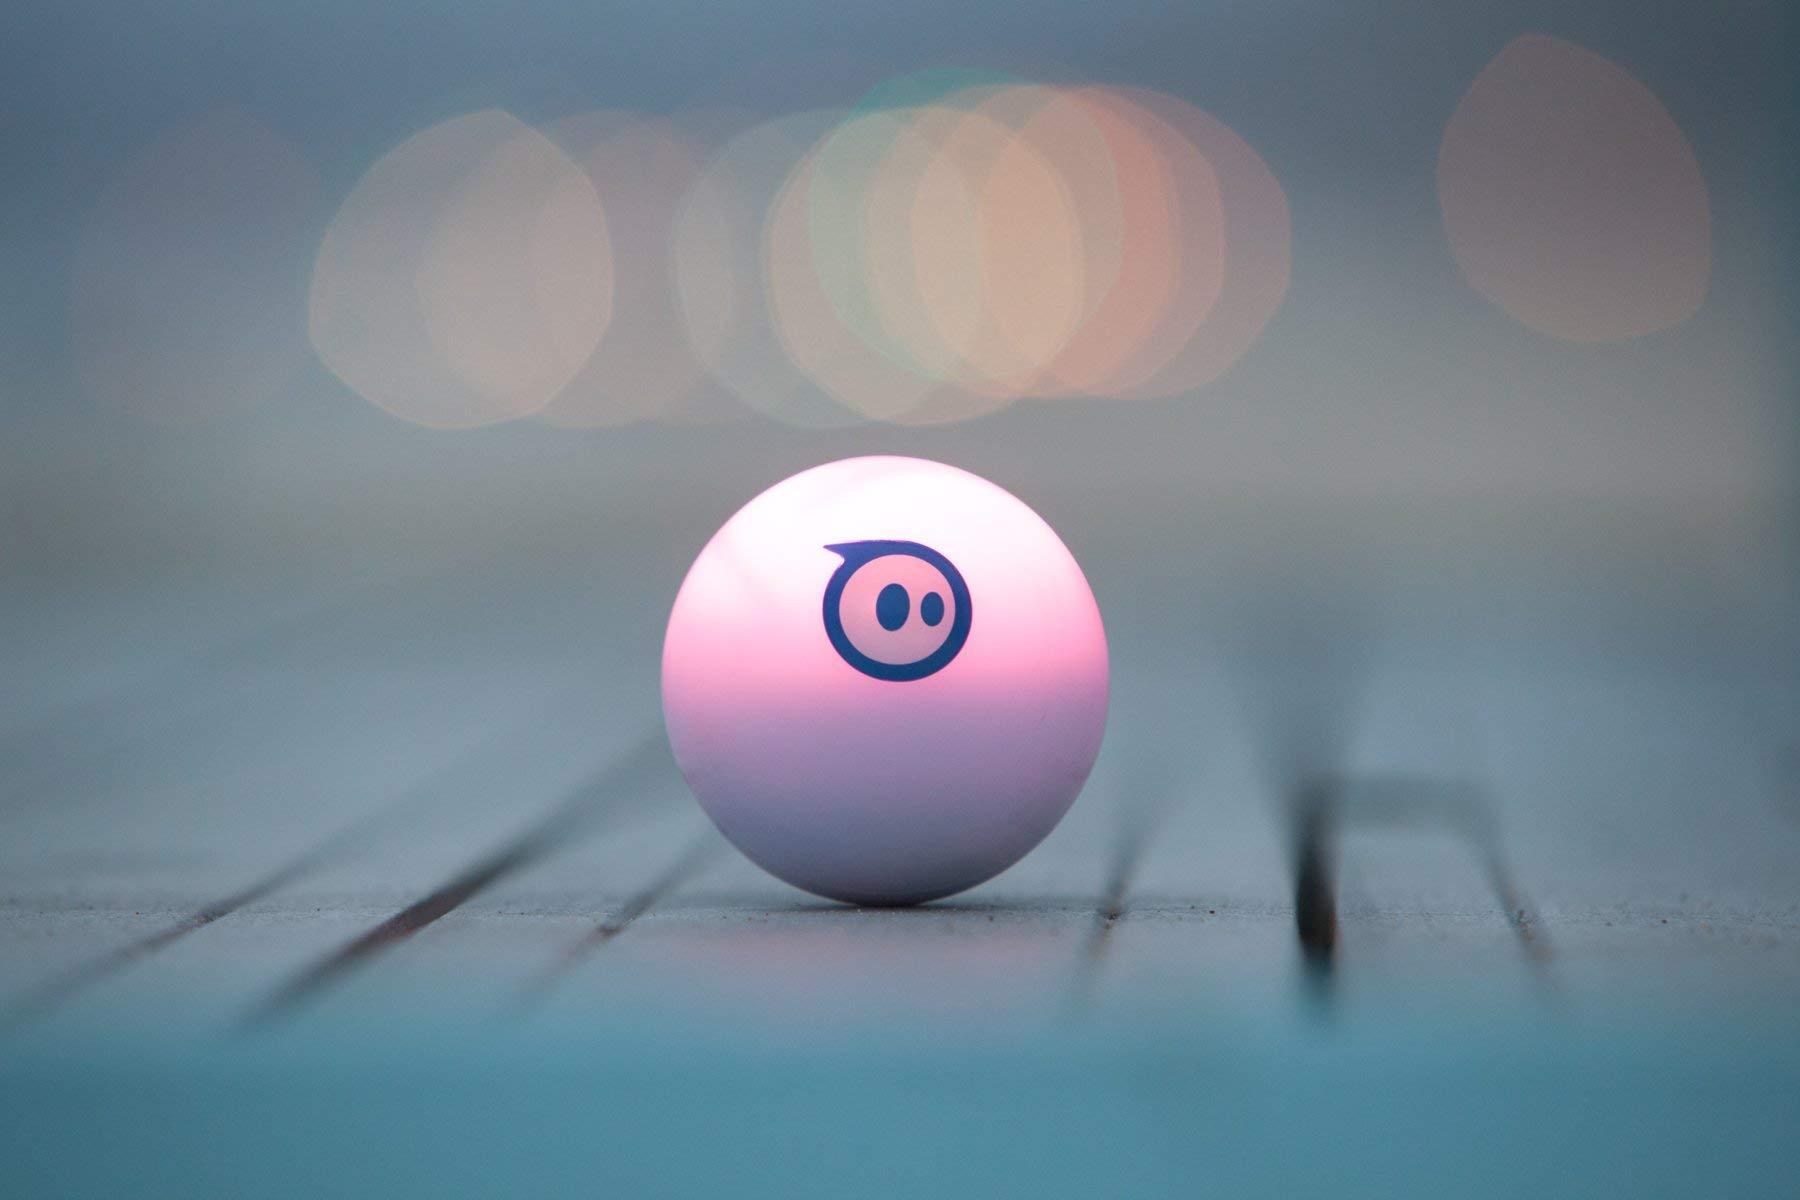 Orbotix S003RW1 Sphero 2.0: The App-Controlled Robot Ball (Renewed) by Sphero (Image #3)